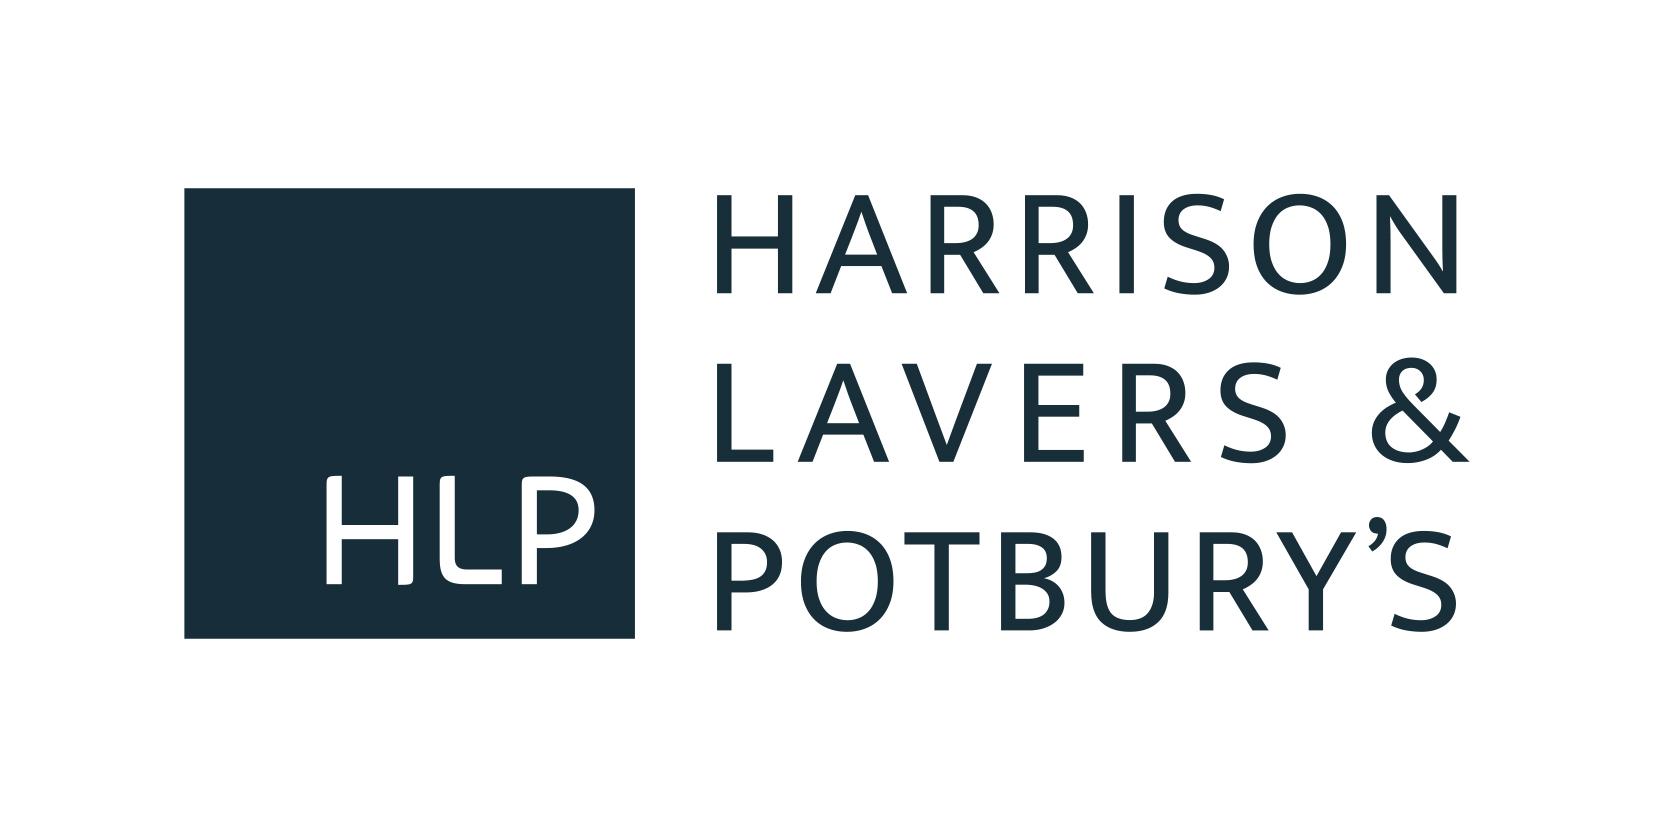 Harrison-Lavers & Potburys Ltd